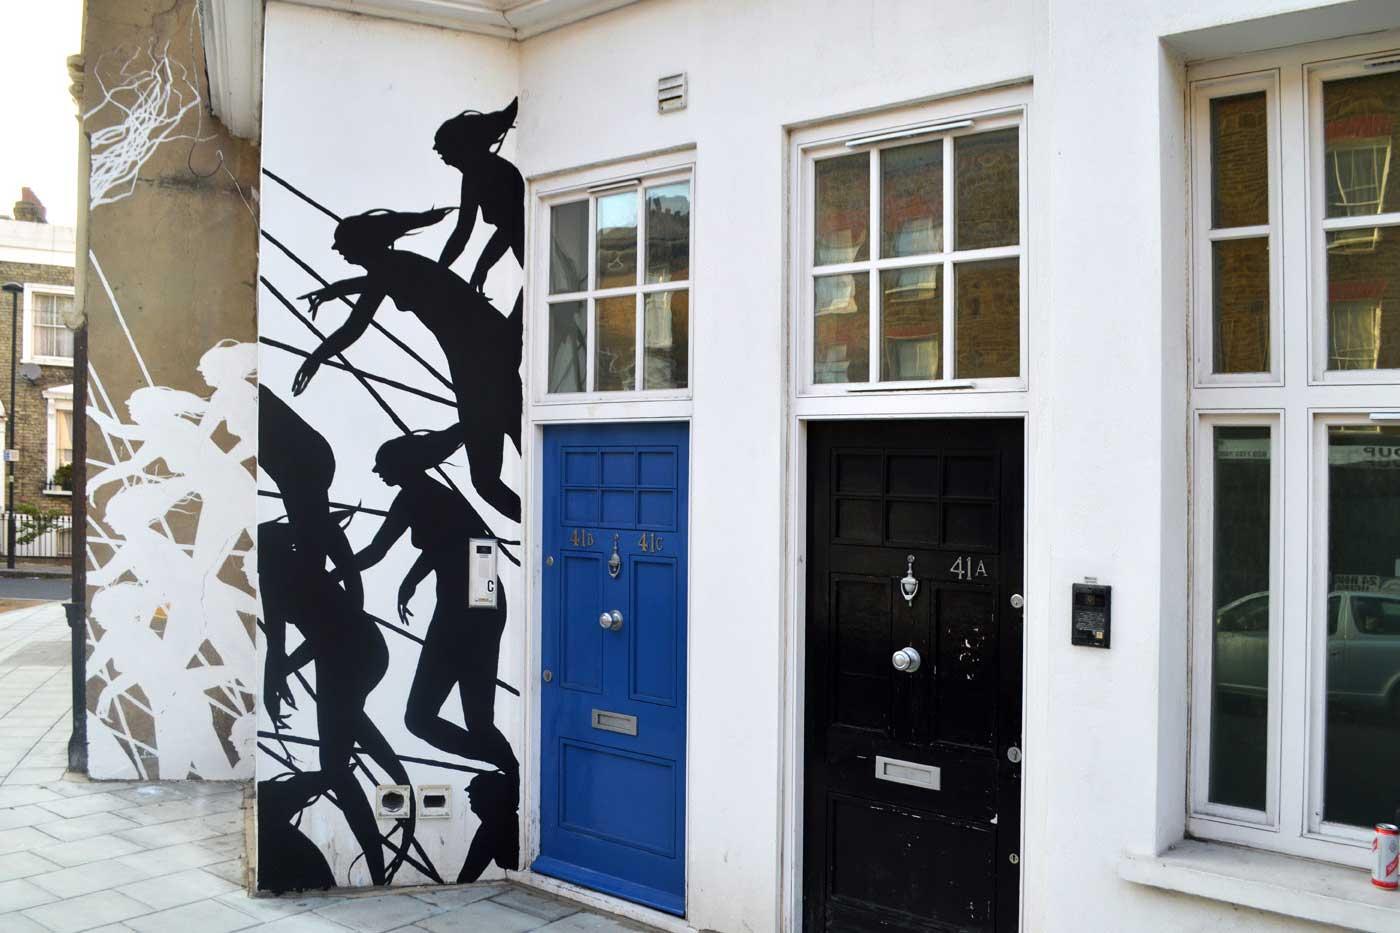 Wunderkammern - Latitude - David de la Mano - London, UK (2015)